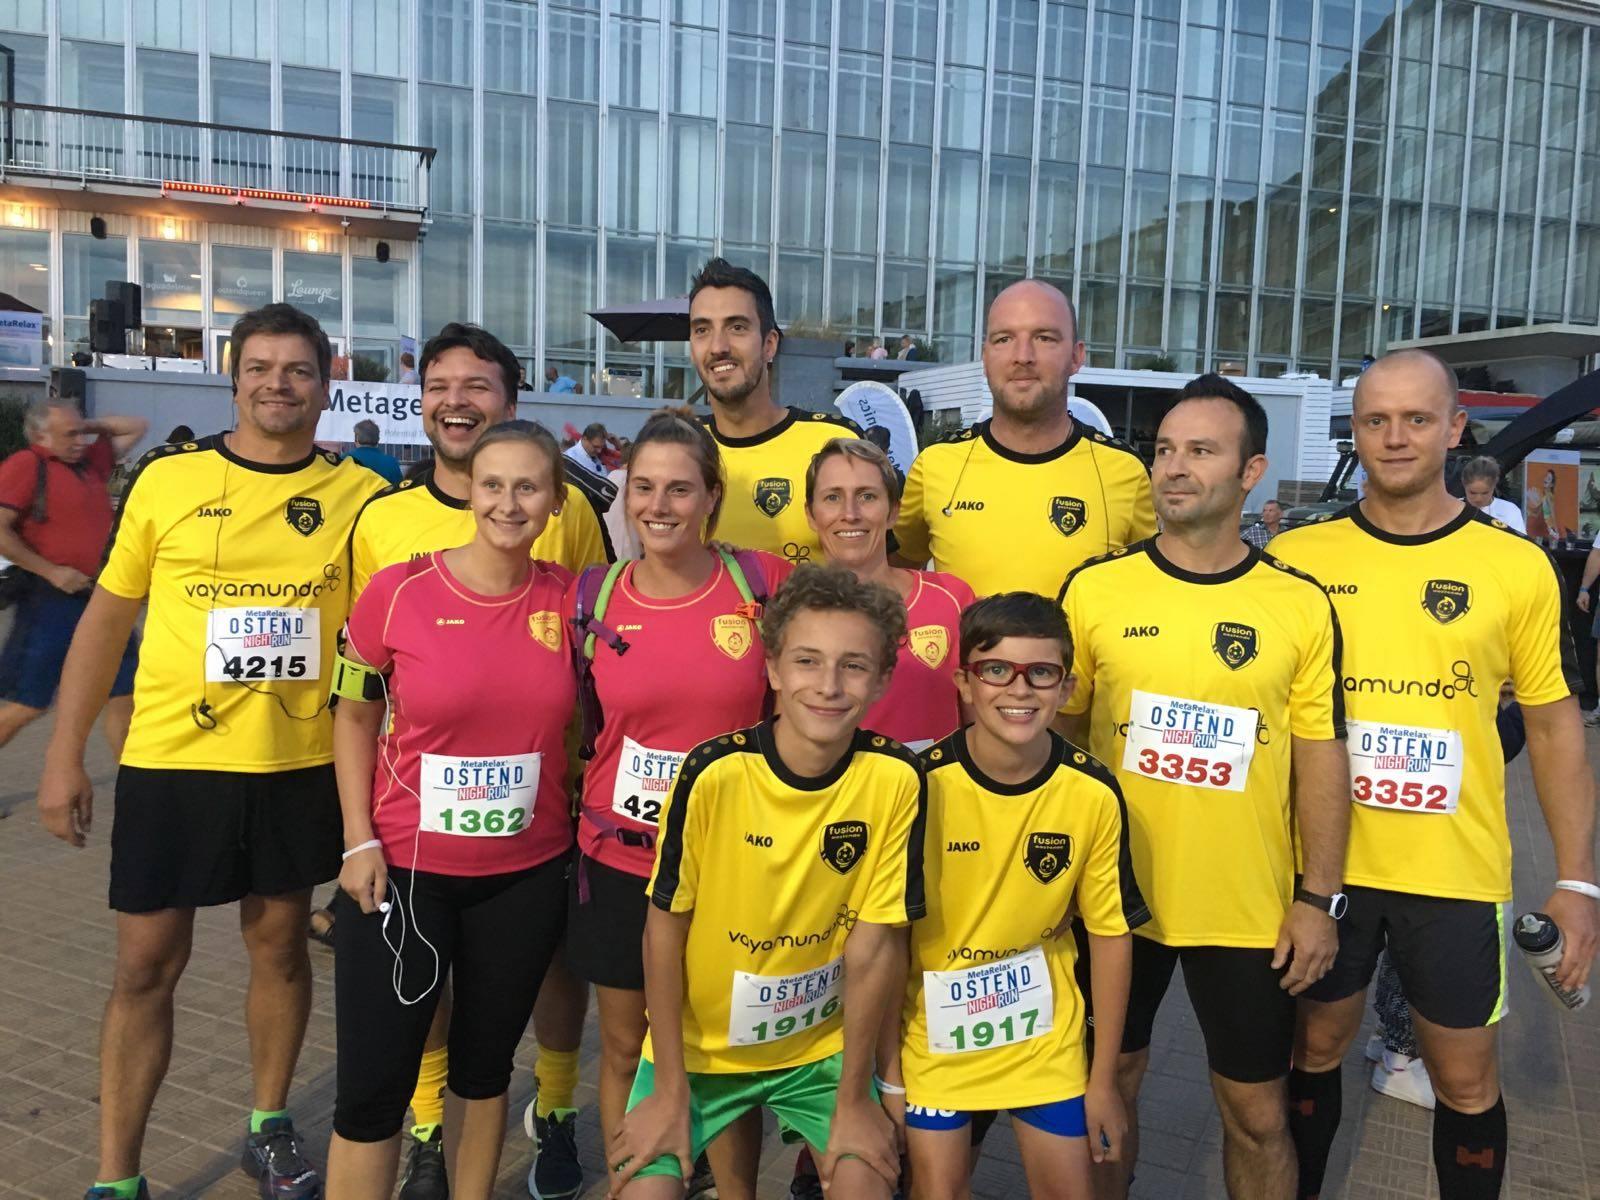 Ostend Night Run 2016